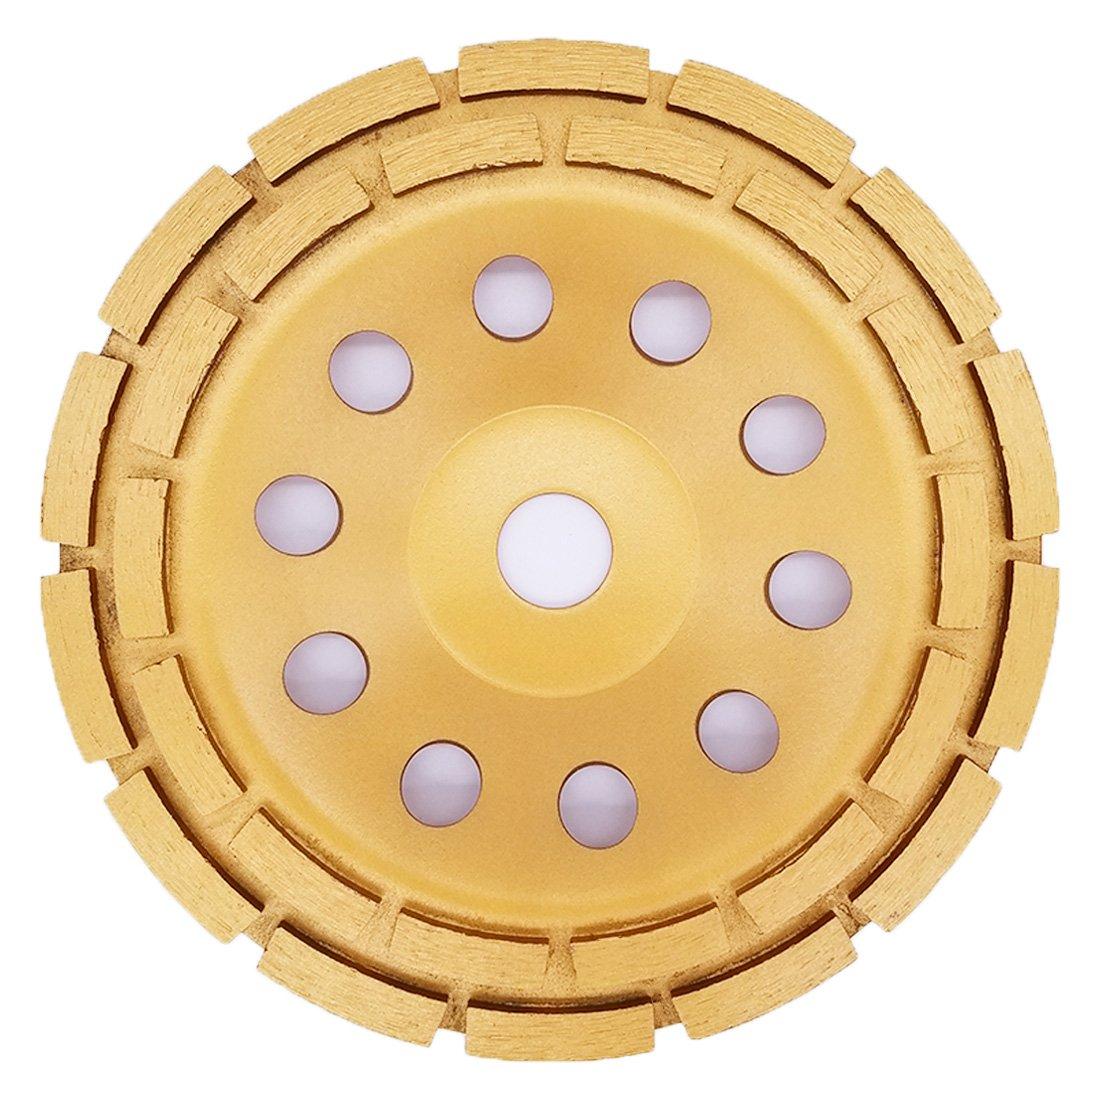 Concrete Grinding Diamond Disc 125mm/4.92', APLUS  Diamond Grinder Disc,  Diamond Cuttig Wheel for Concrete, Marble, Granite, Stone, Cement and Ceramics,  Diamond Cup Wheel for Angle Grinder